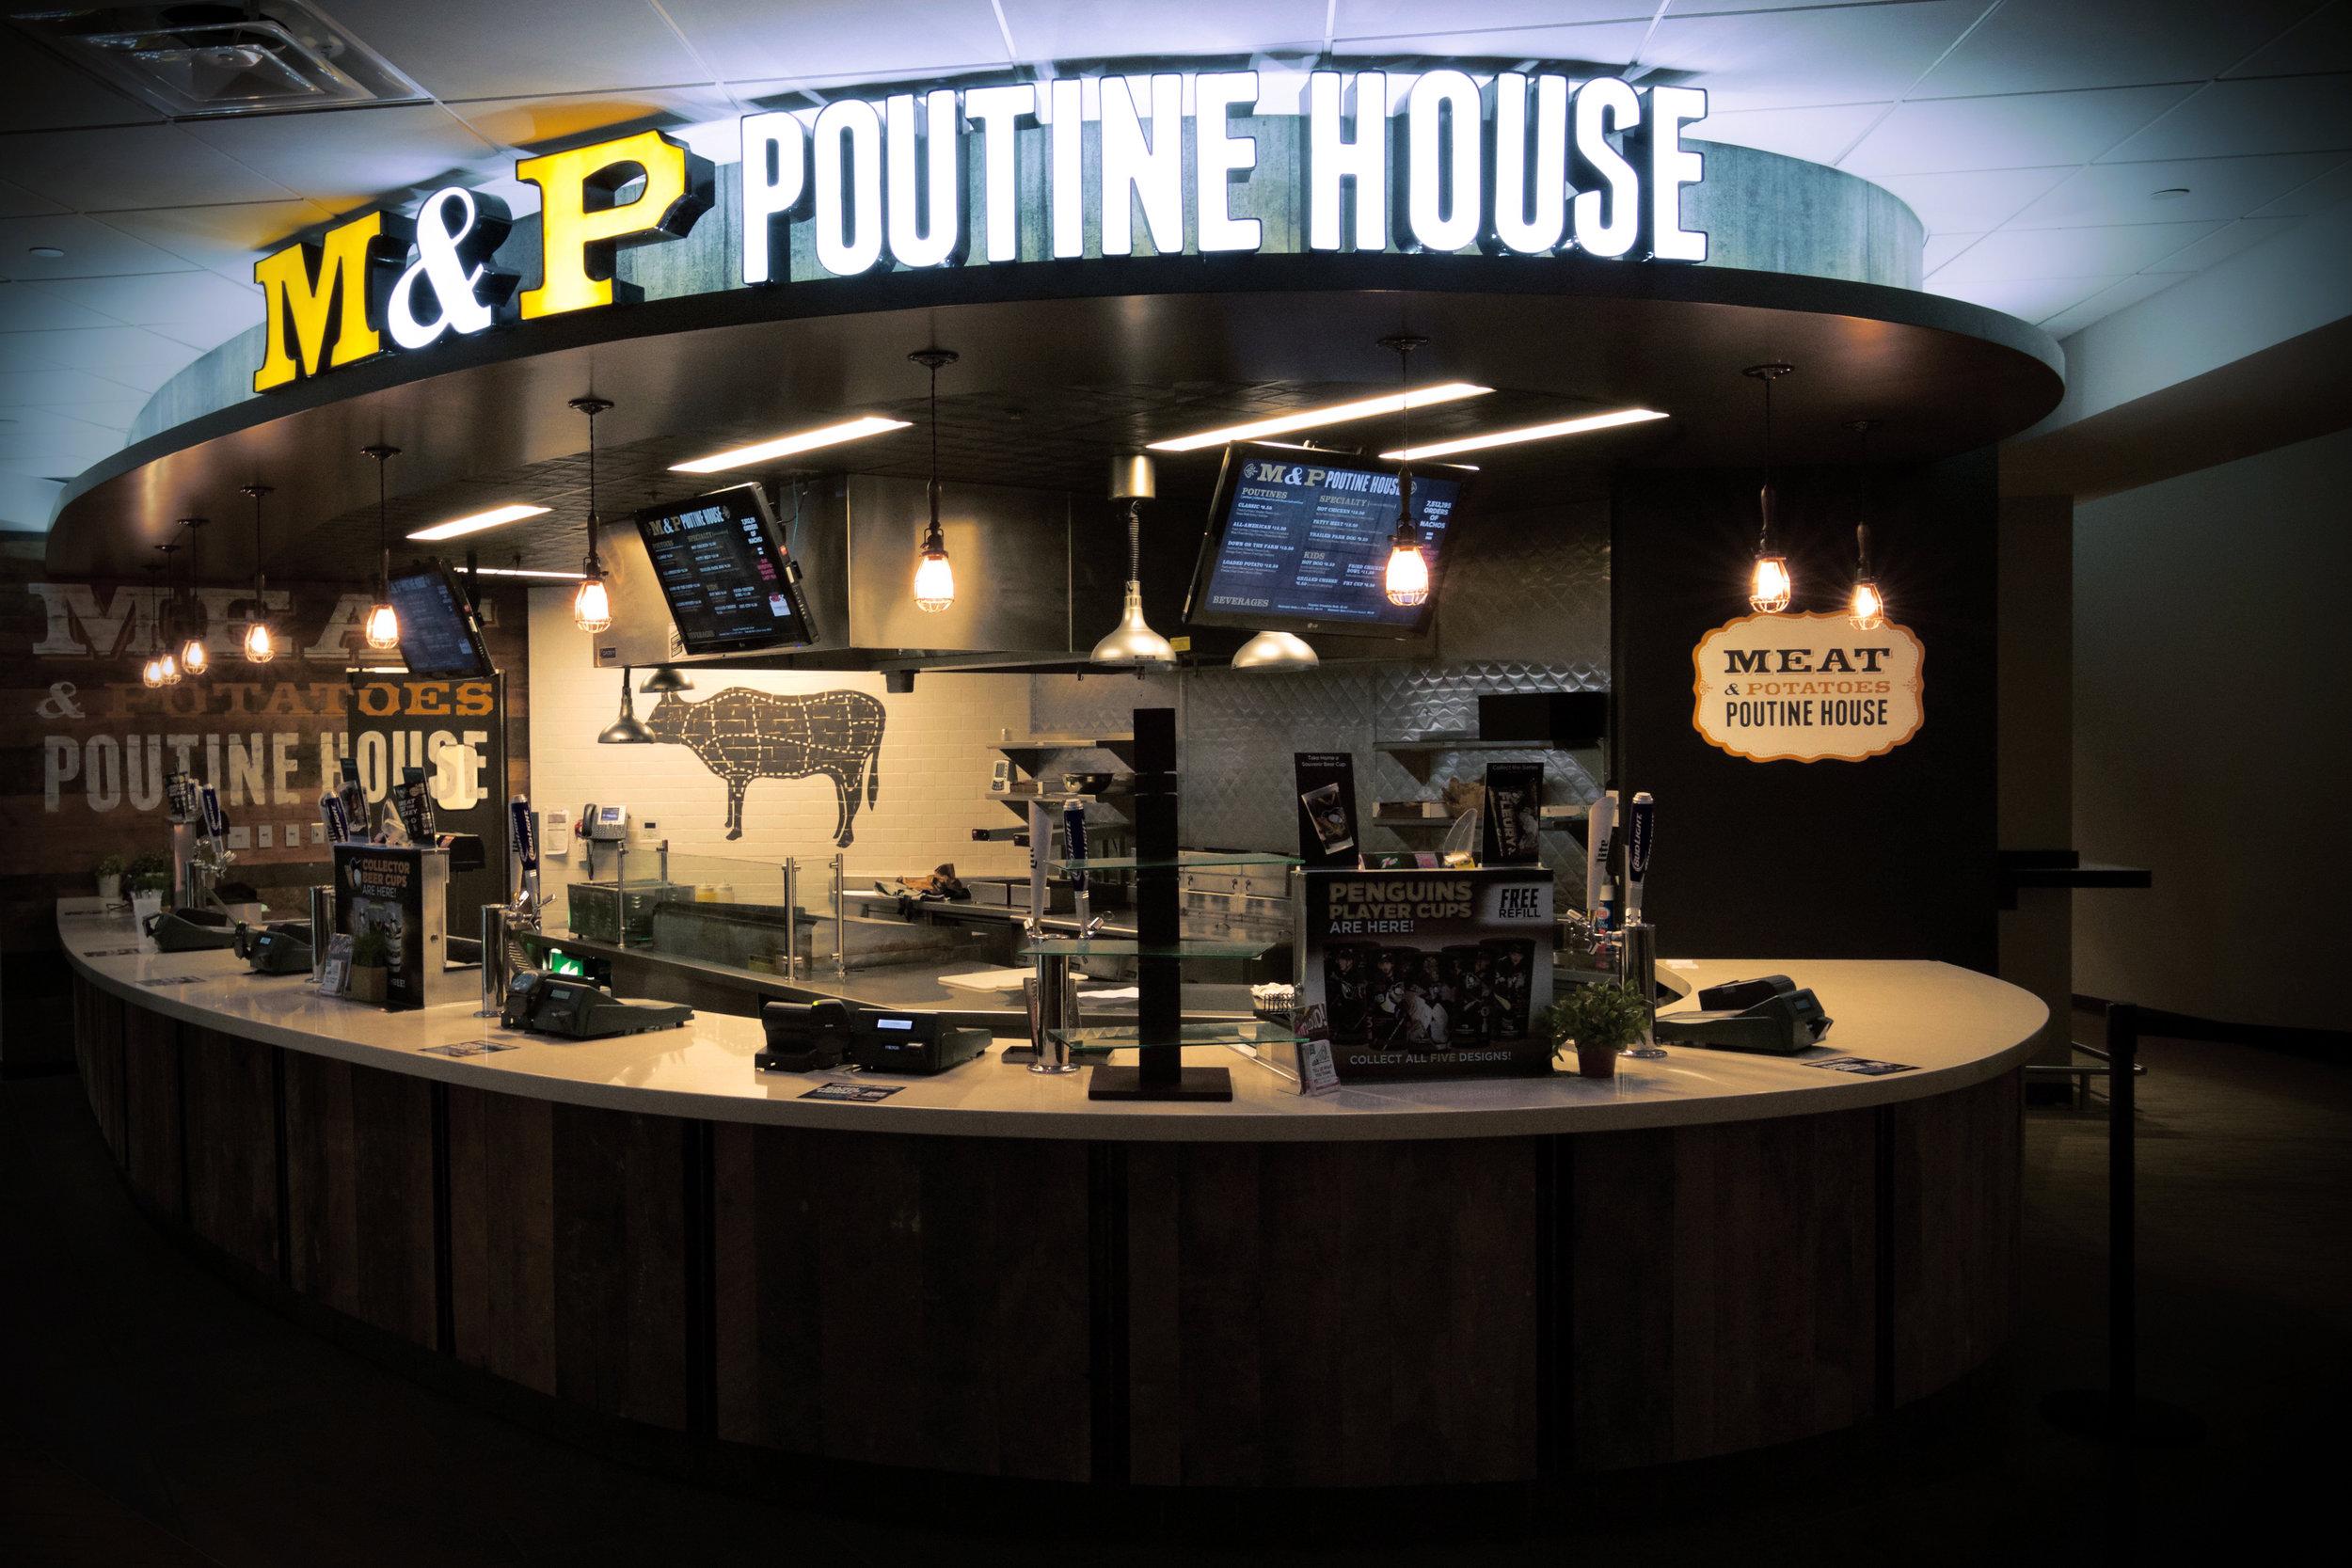 restaurant_Branding_Meat-&-Potatoes_bootstrap-design-co_Signage.jpg